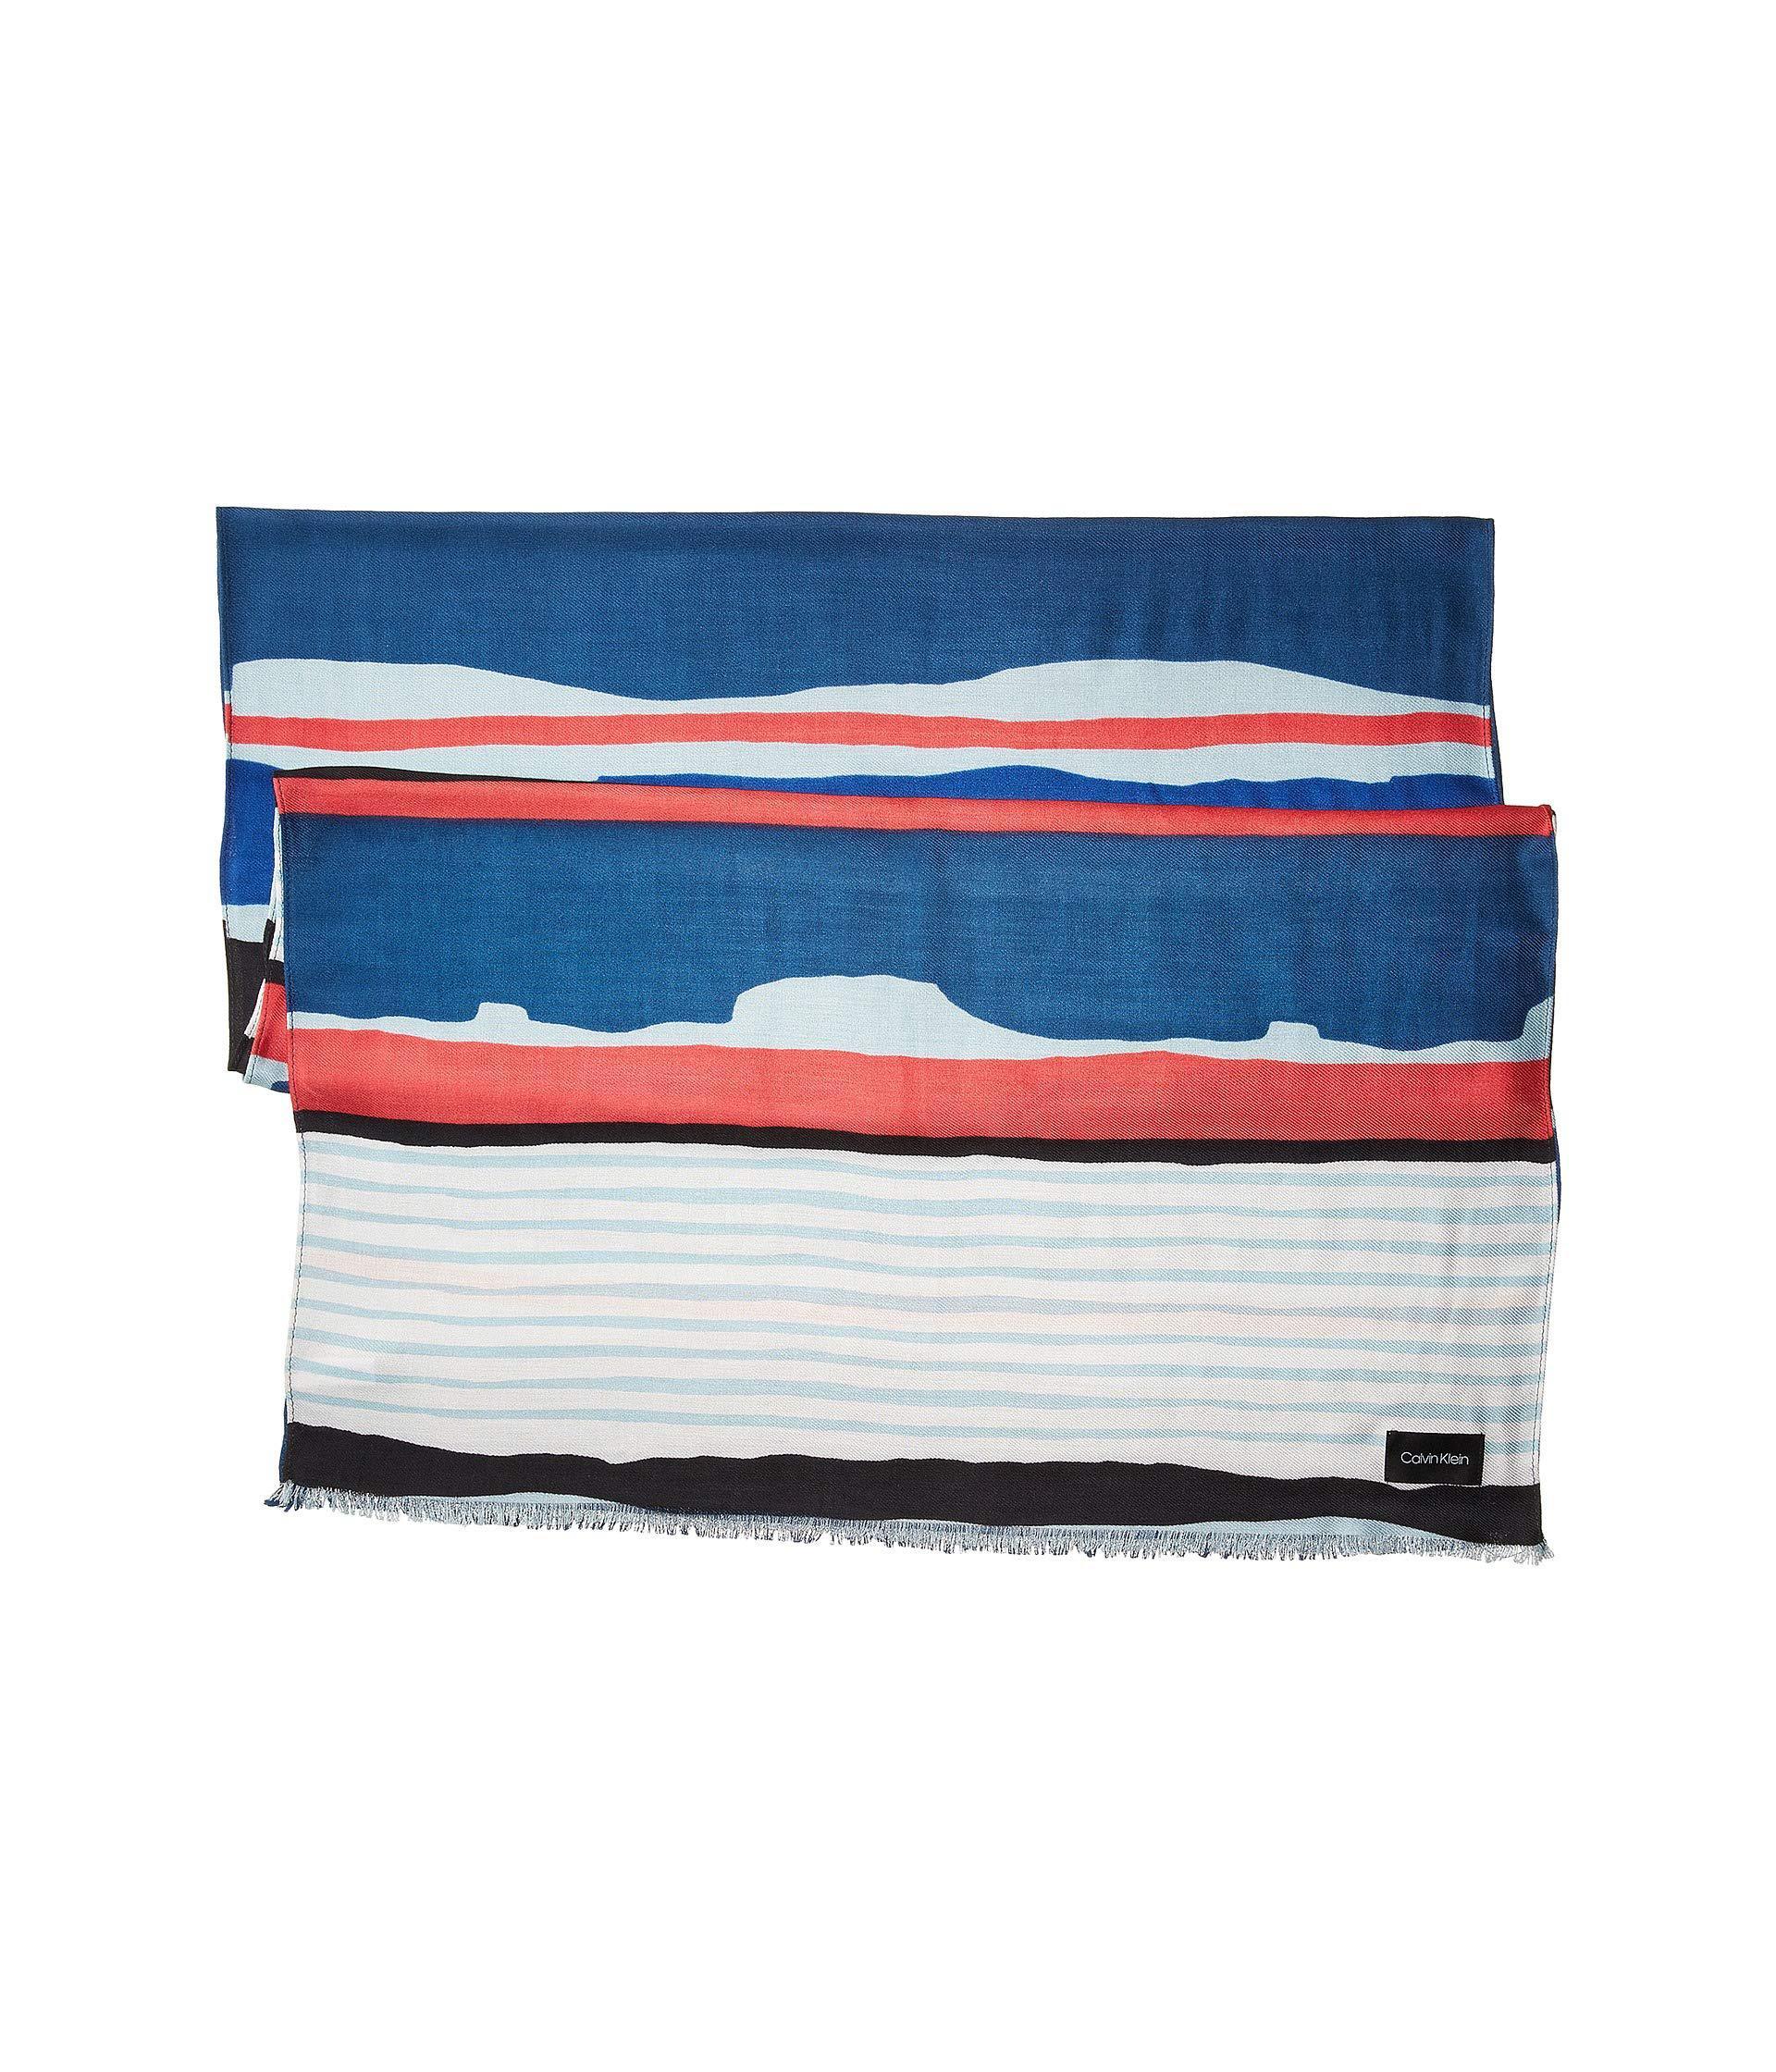 Lyst - Calvin Klein Painterly Colorblock Stripe Pashmina in Blue - Save  14.285714285714292% 672e49d59e3